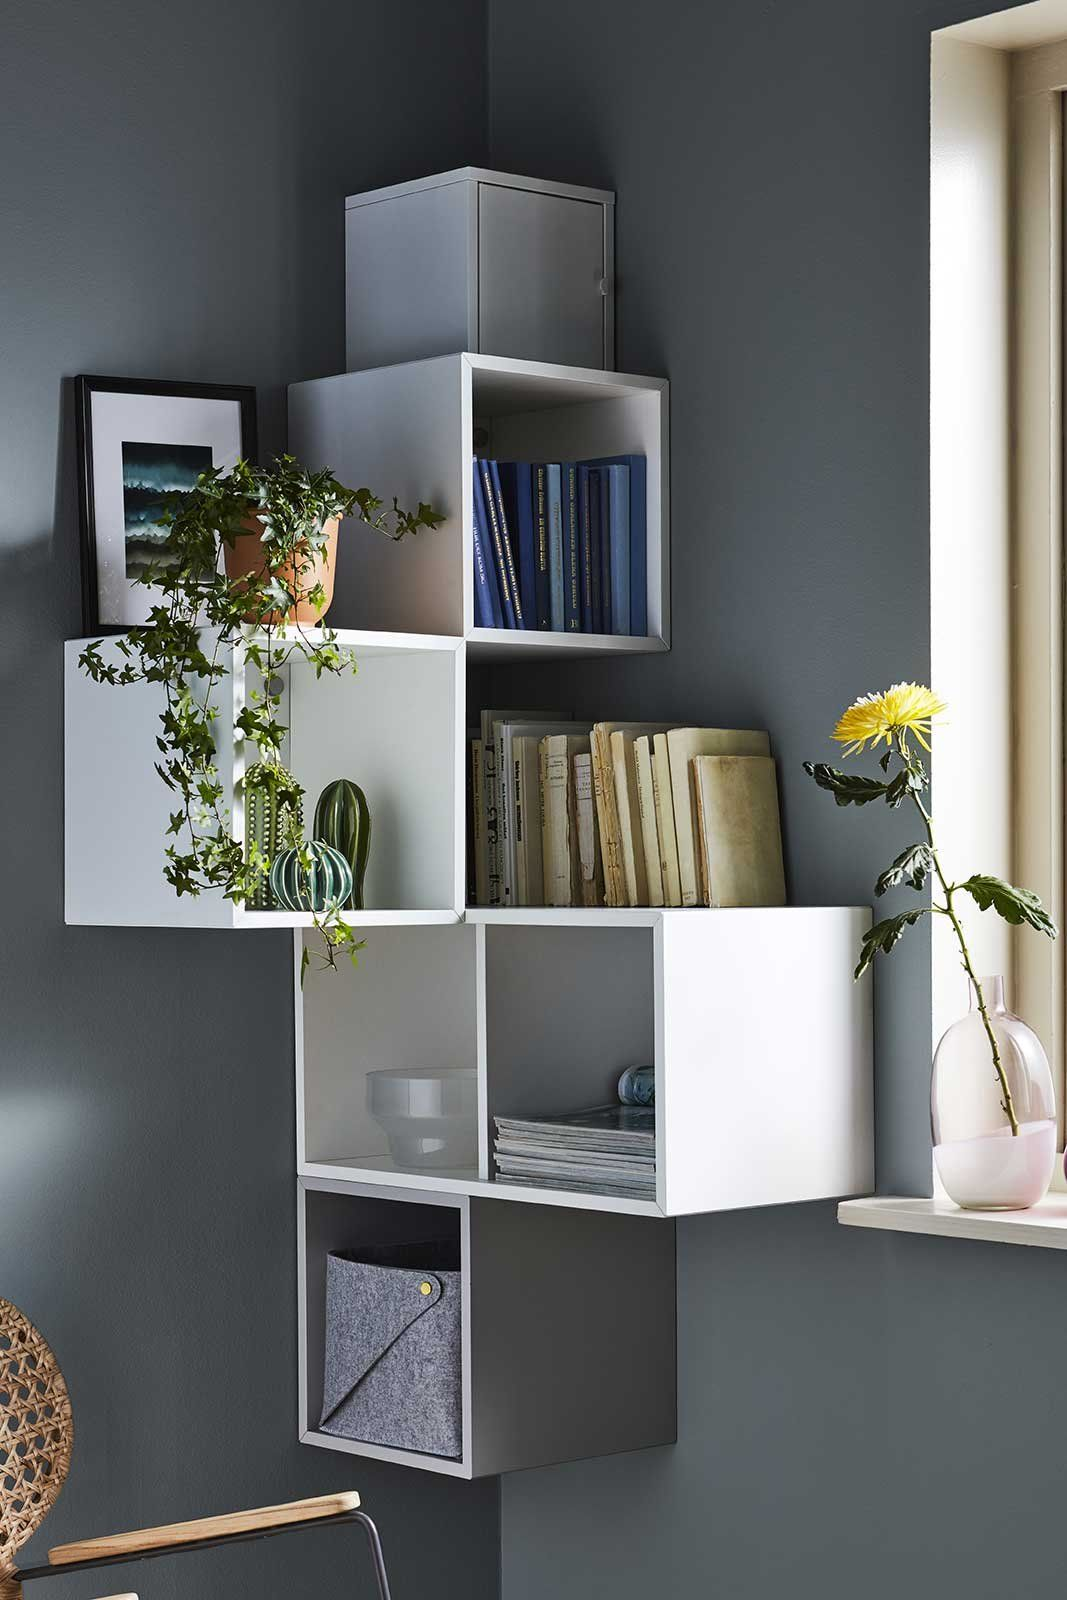 Https Cache Marieclaire Fr Data Photo W1067 C17 5i Meuble Angle Cube Ikea Jpg En 2020 Meuble D Angle Diy Meuble Ikea Mobilier De Salon